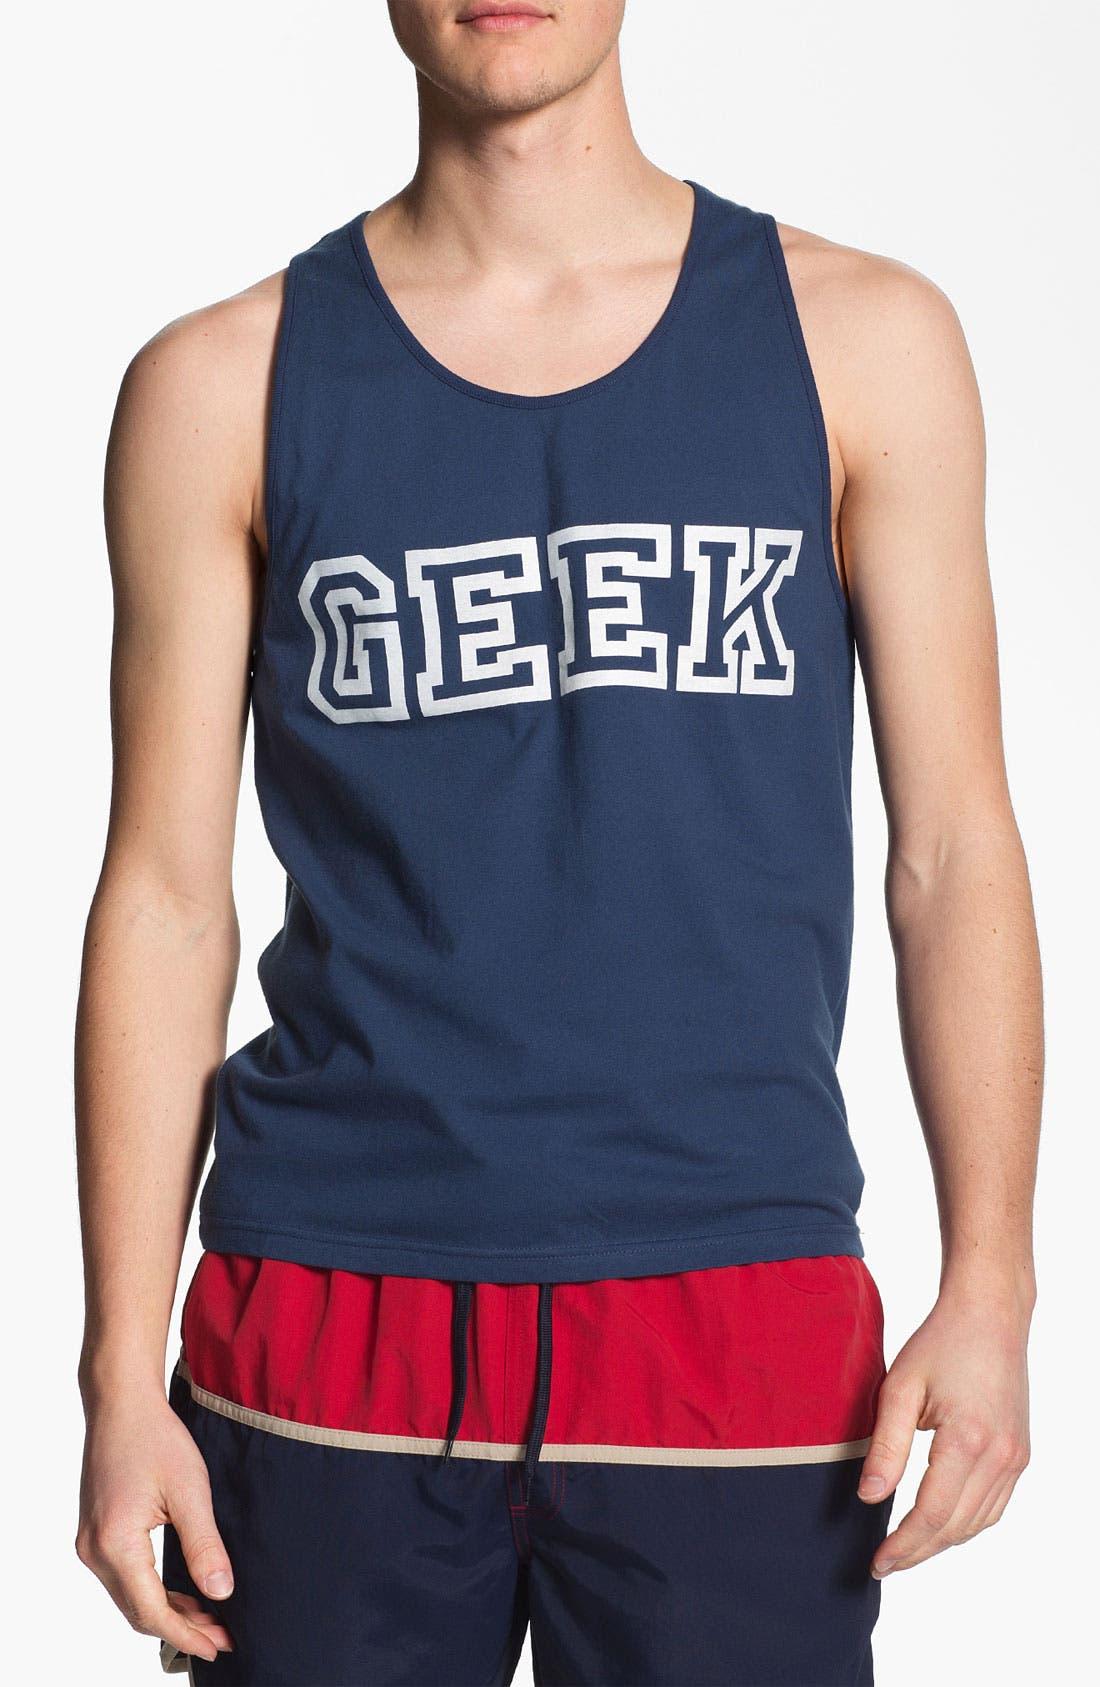 Alternate Image 1 Selected - Topman 'Geek' Print Tank Top